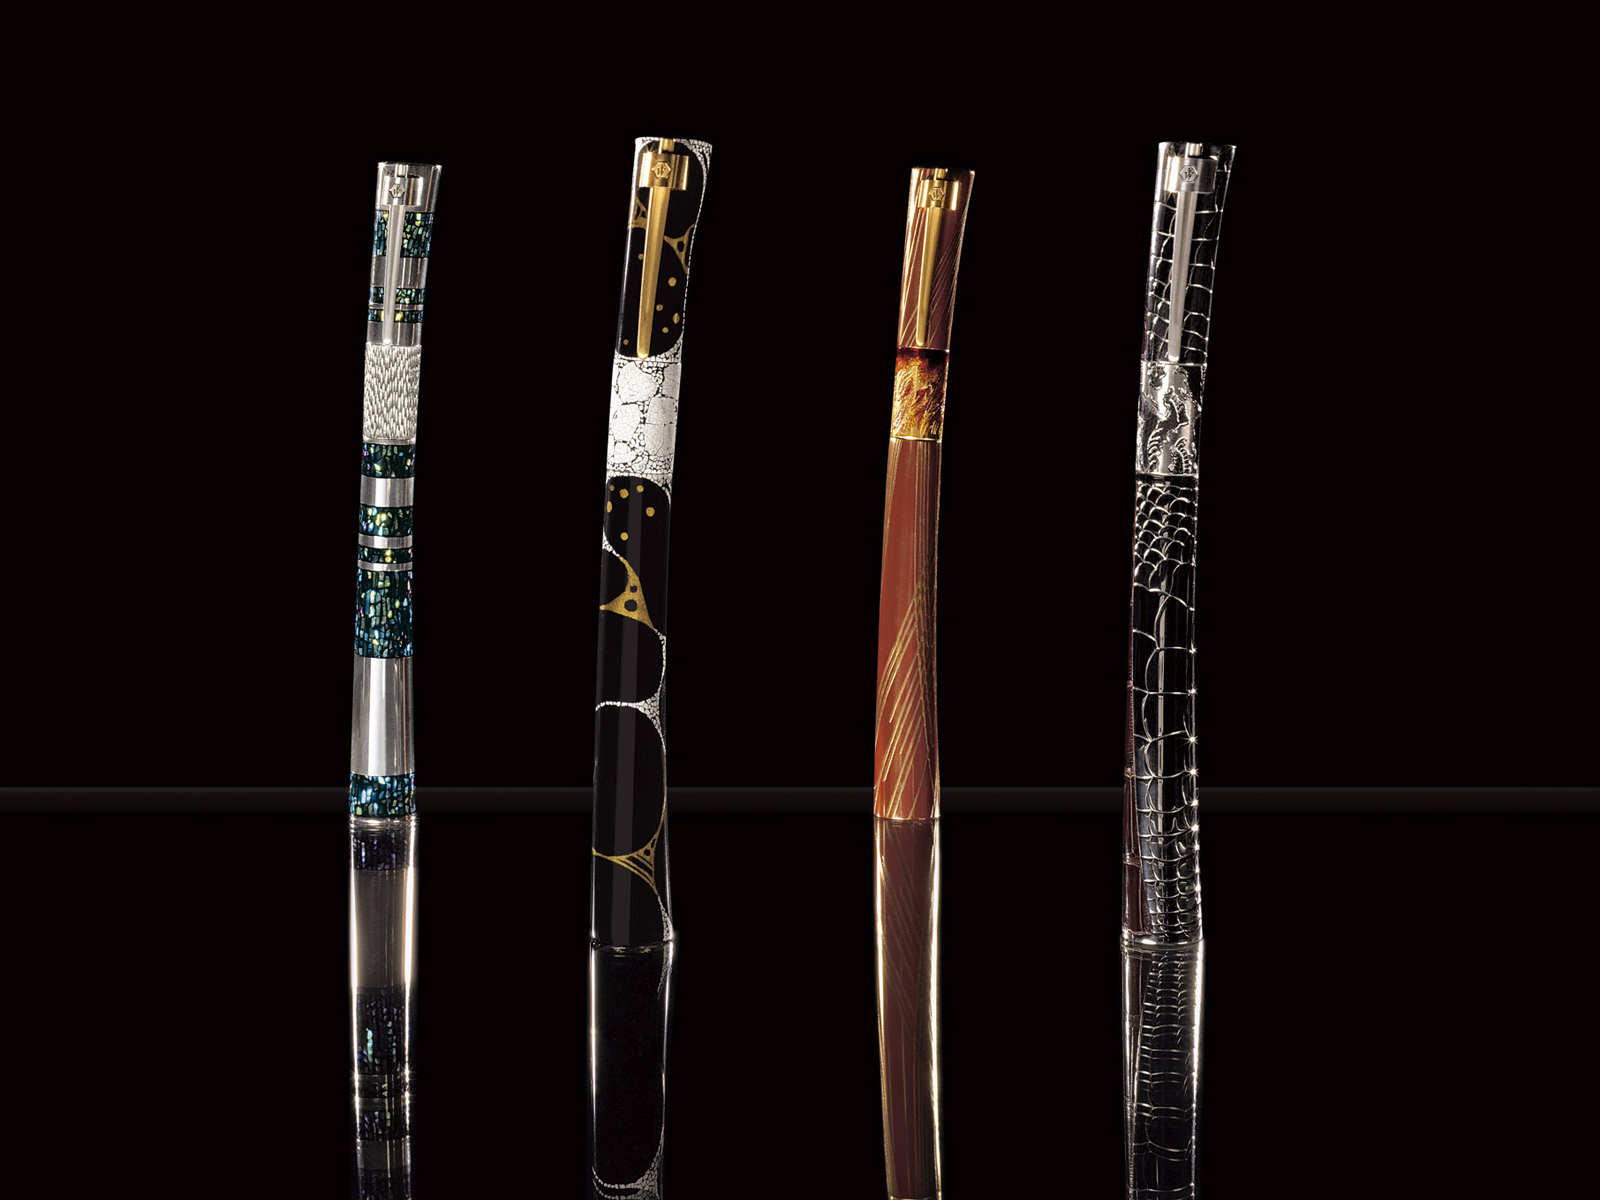 cool katana swords art hd wallpaper the wallpaper database